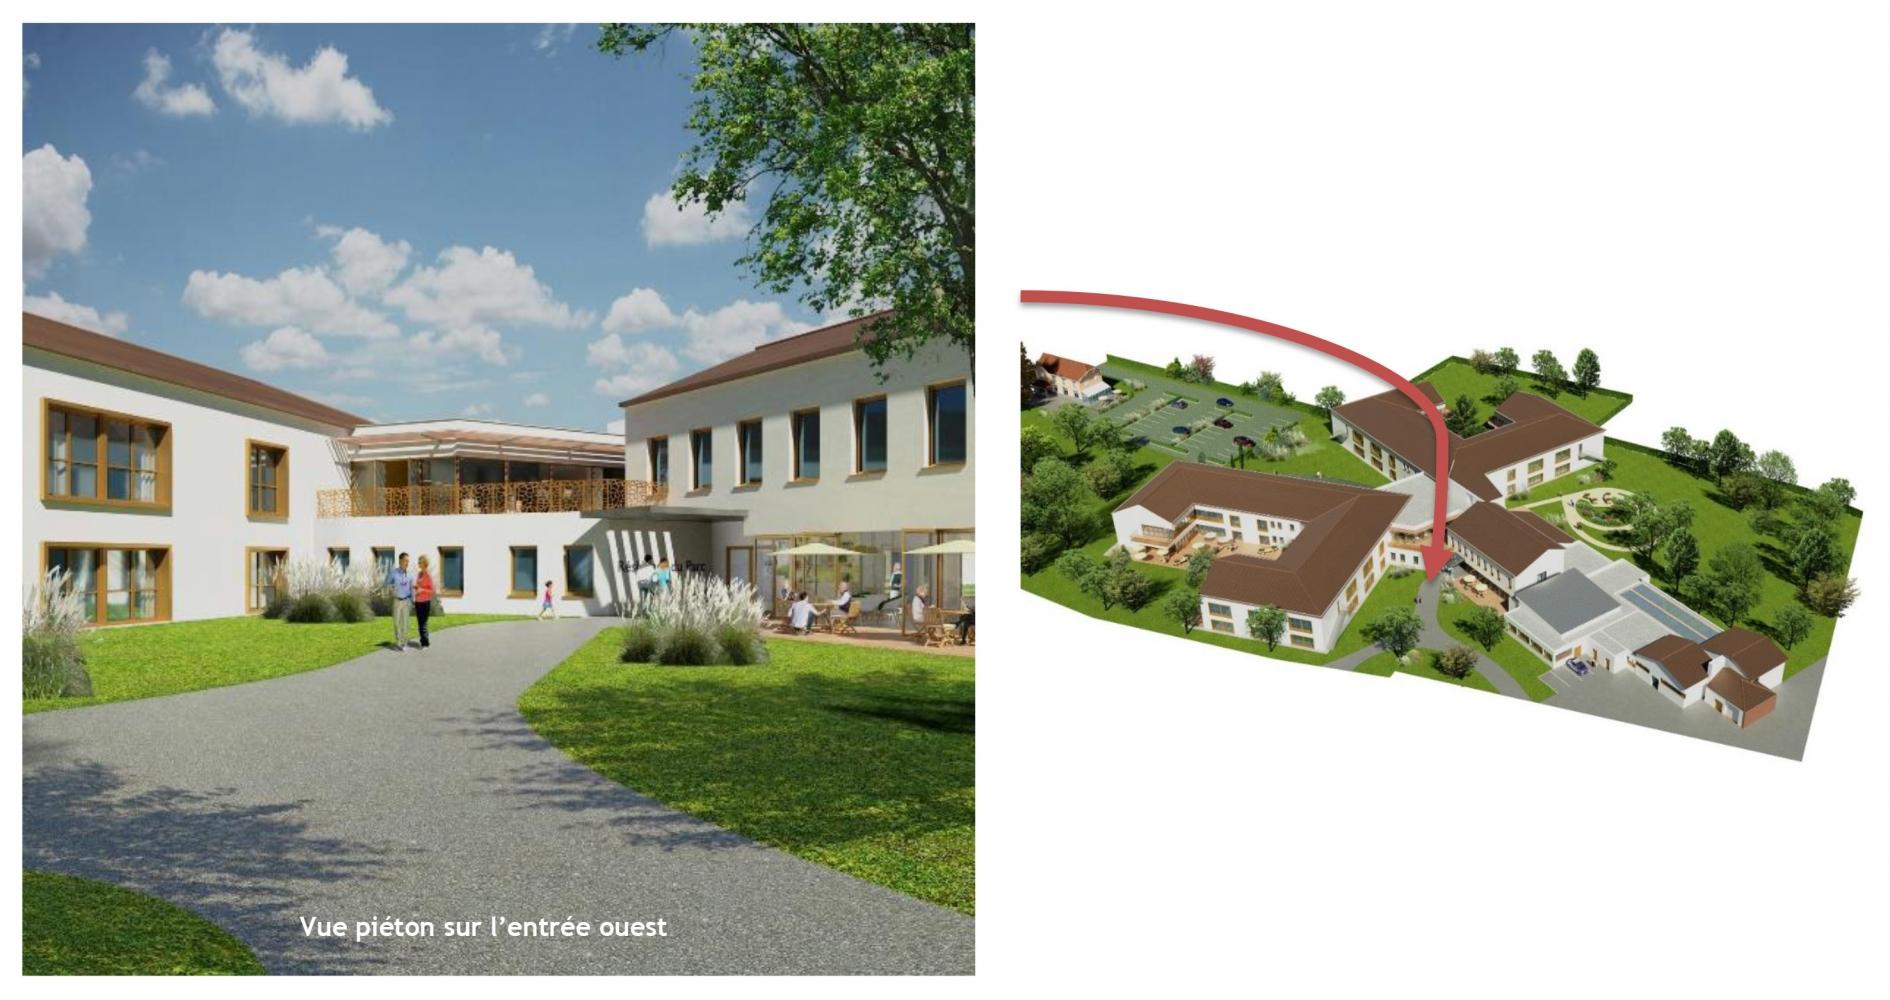 01-st-germain-img-003 Pascale SEURIN Architecte - Médico-Social